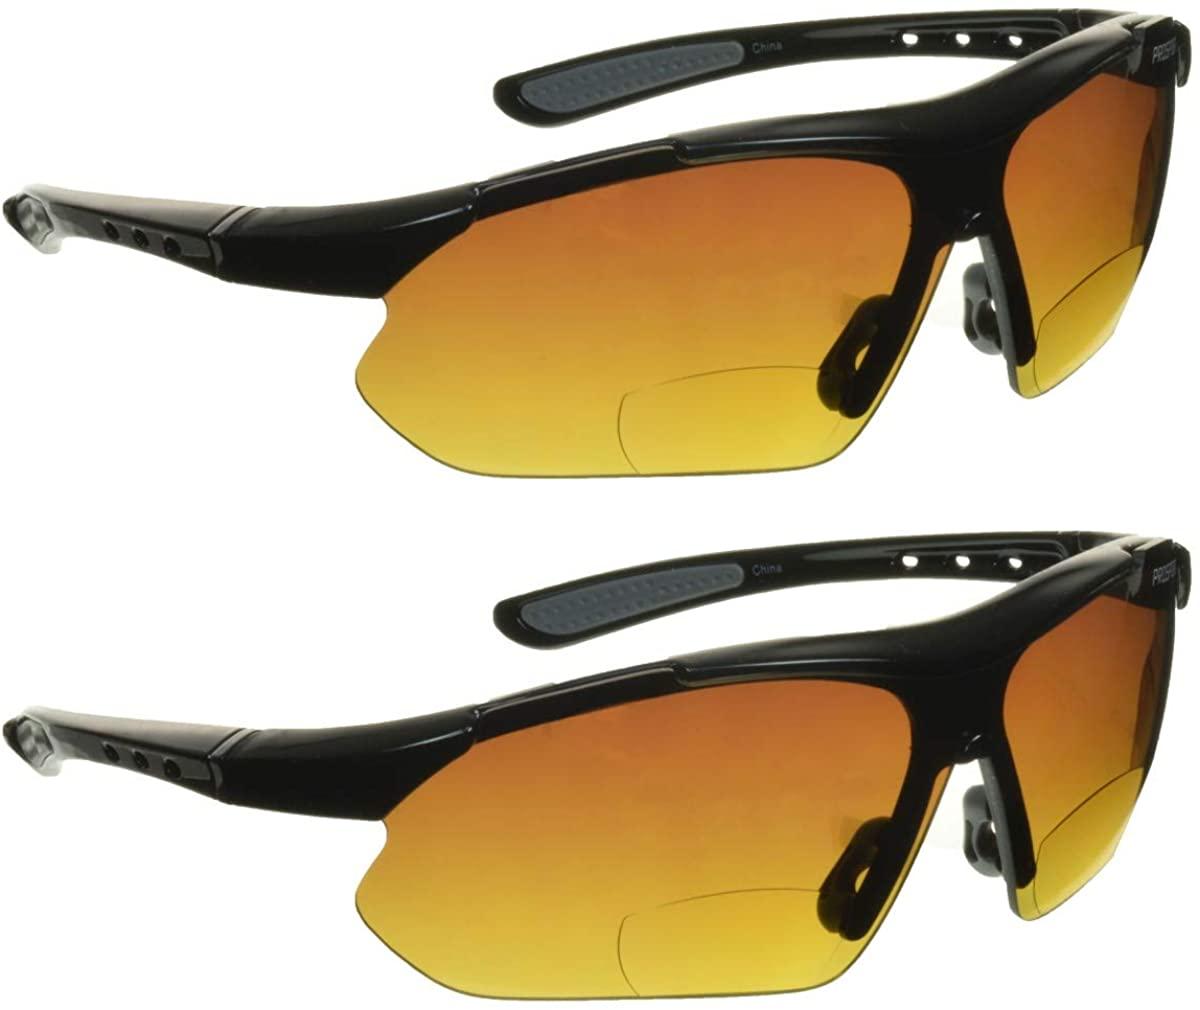 proSPORT Bifocal Sunglasses Mens Womens HD Vision Semi Rimless Wraparound Frame. Cycling, Running, Fishing, Golf and Driving